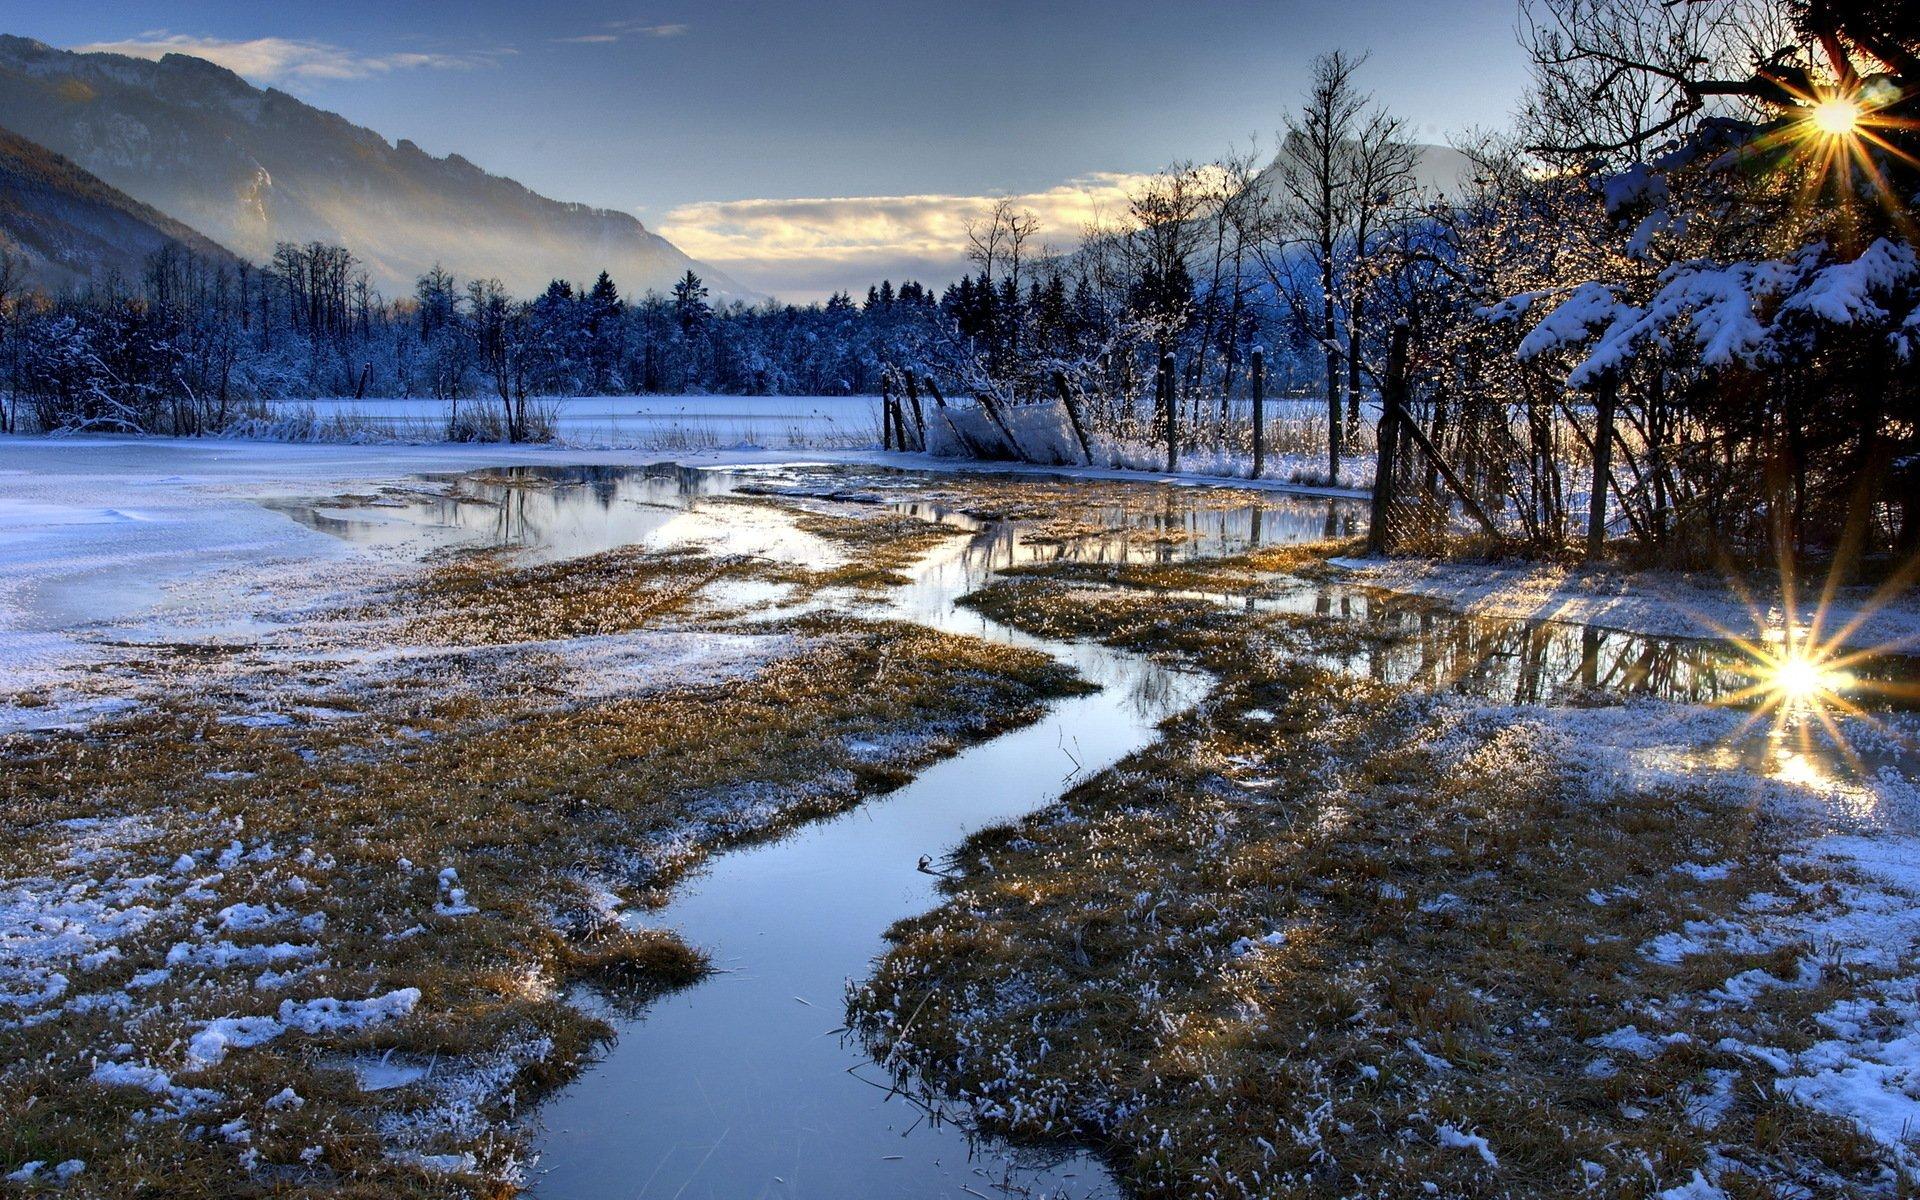 winter wonderland wallpaper iphone